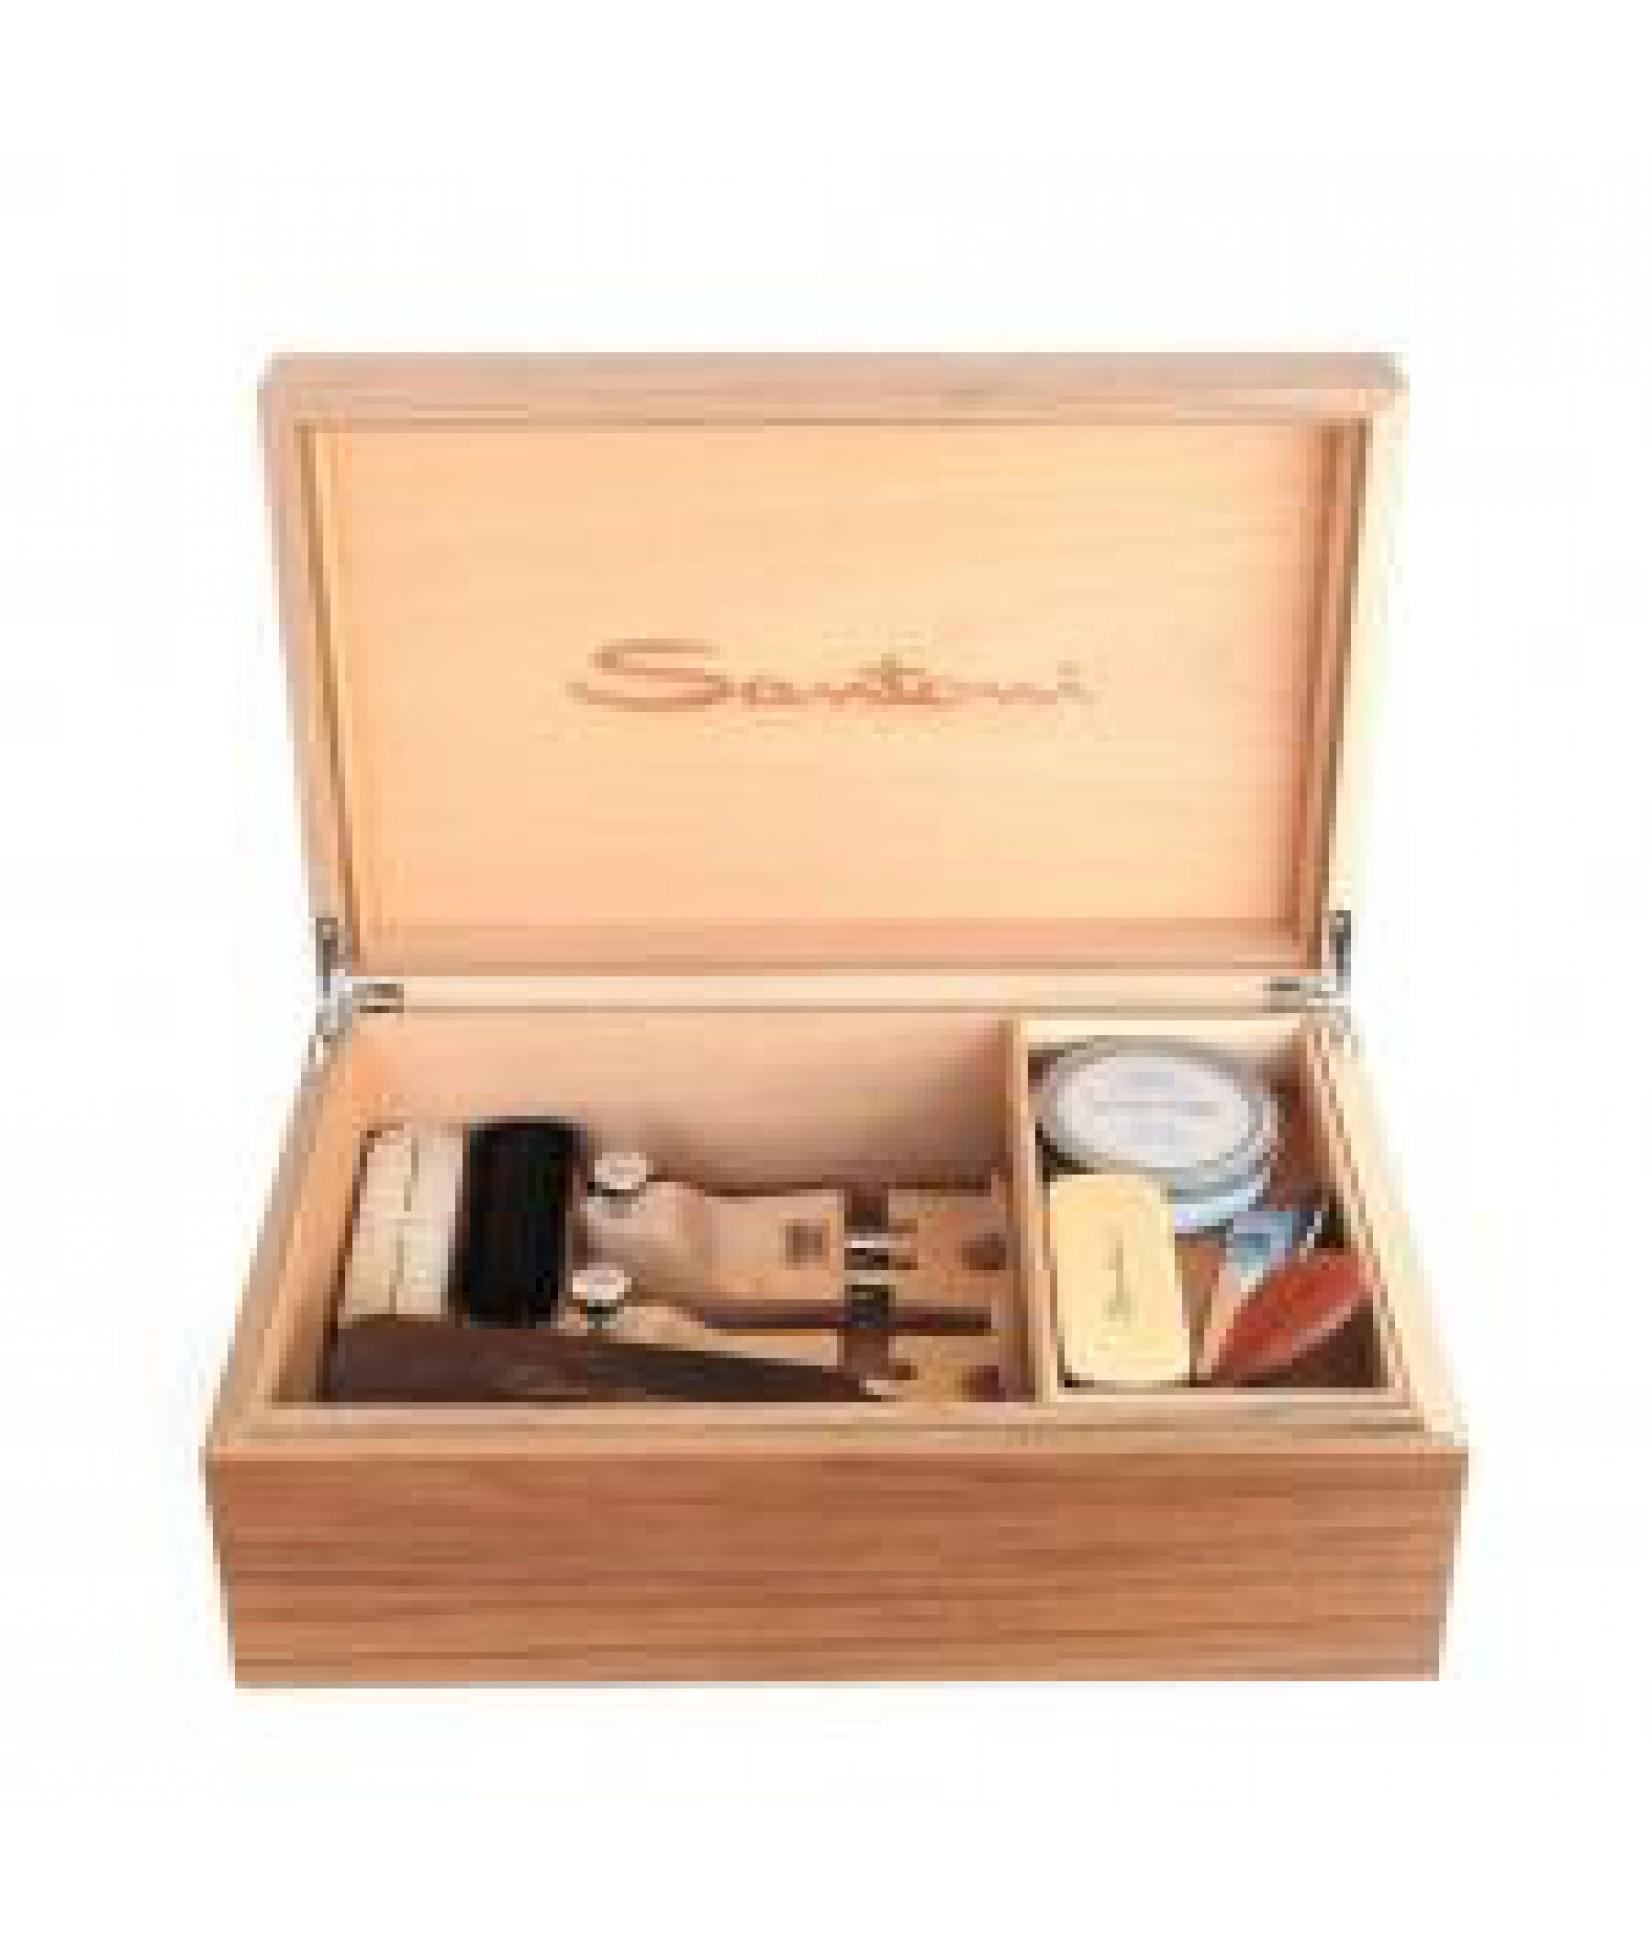 Santoni 鞋具护理箱